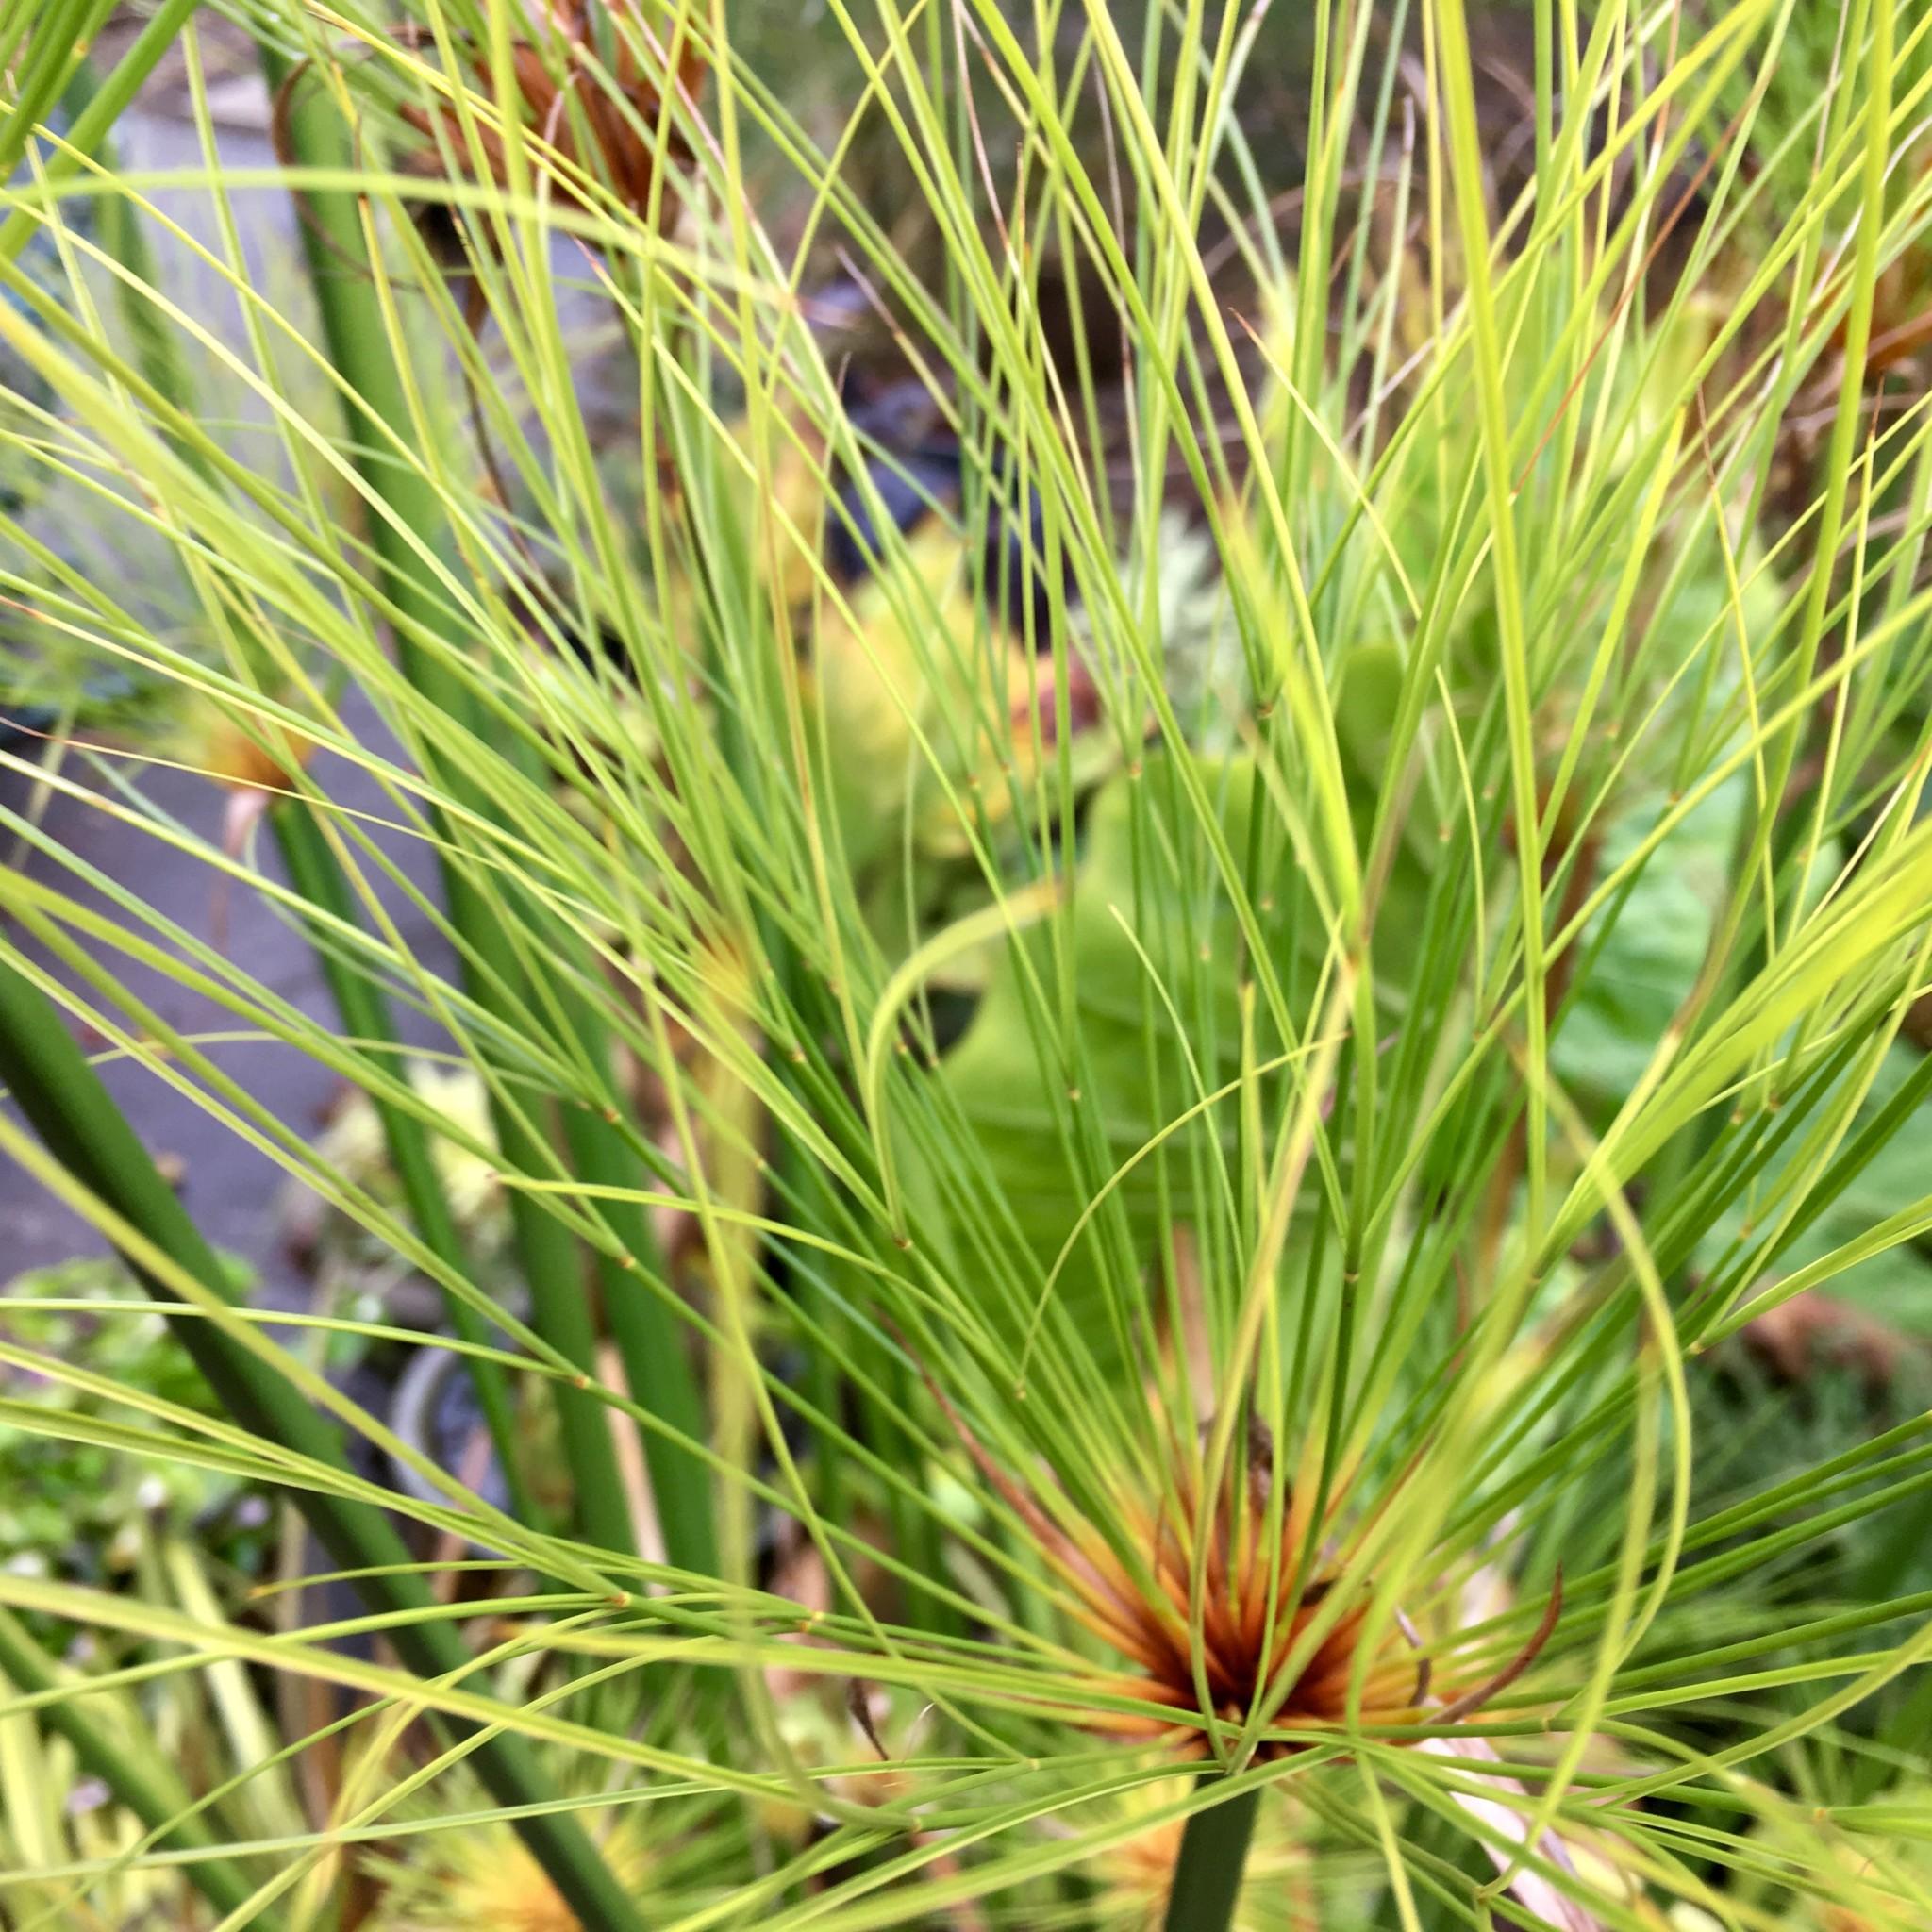 Cyperus papyrus aka Egyptian Papyrus